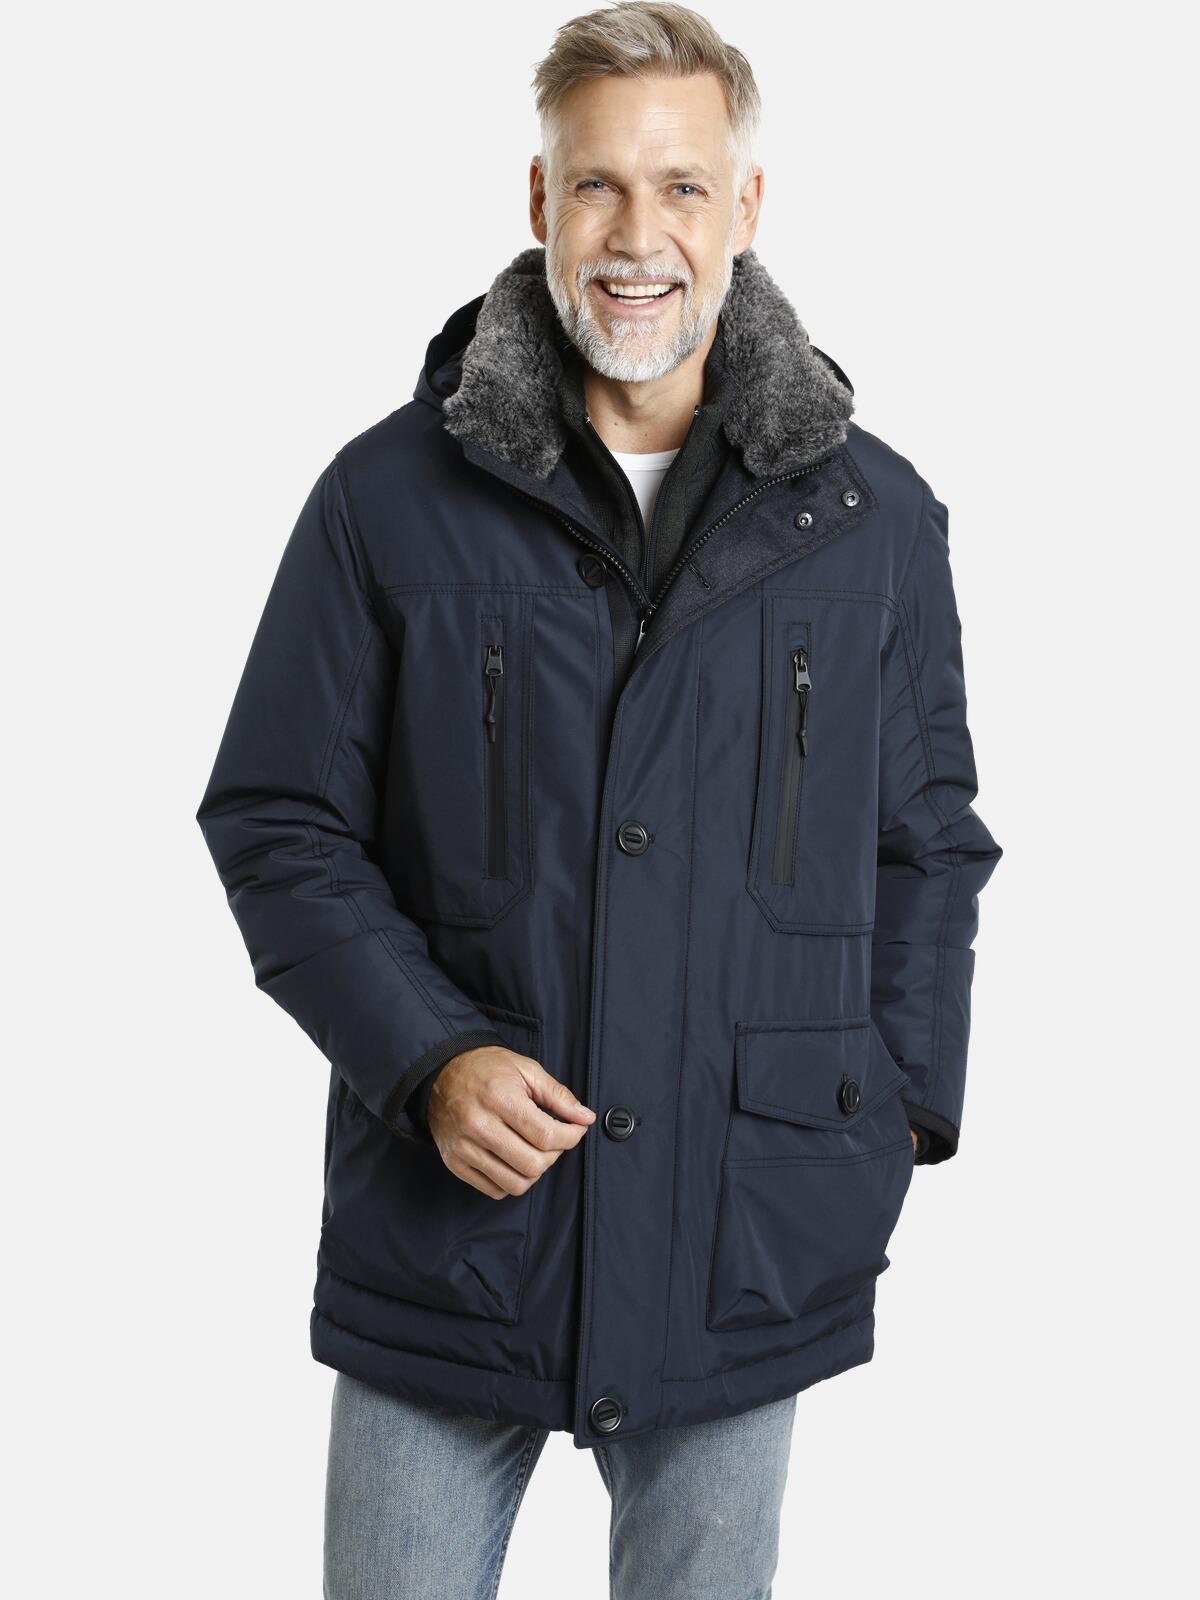 jan vanderstorm -  Winterjacke BOTULFR, mit abnehmbarer Kapuze